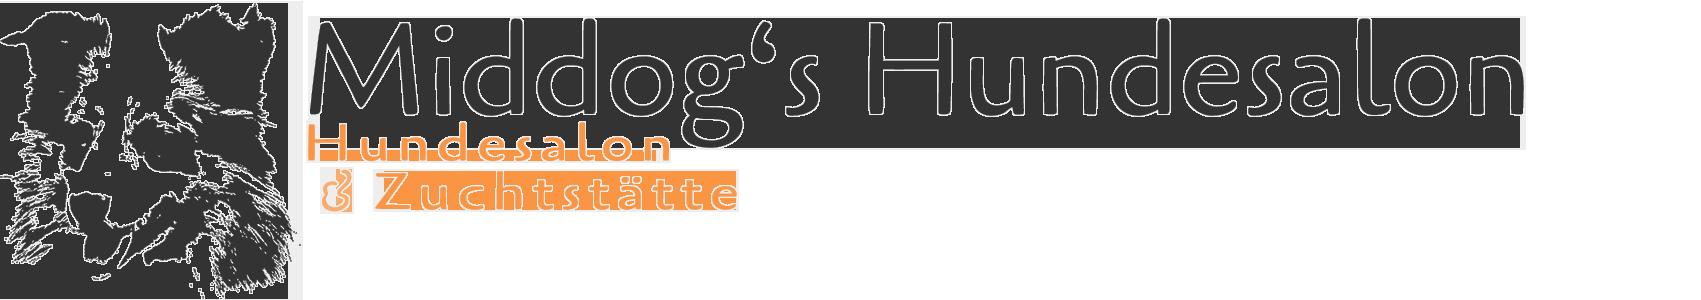 Middog's Hundesalon logo